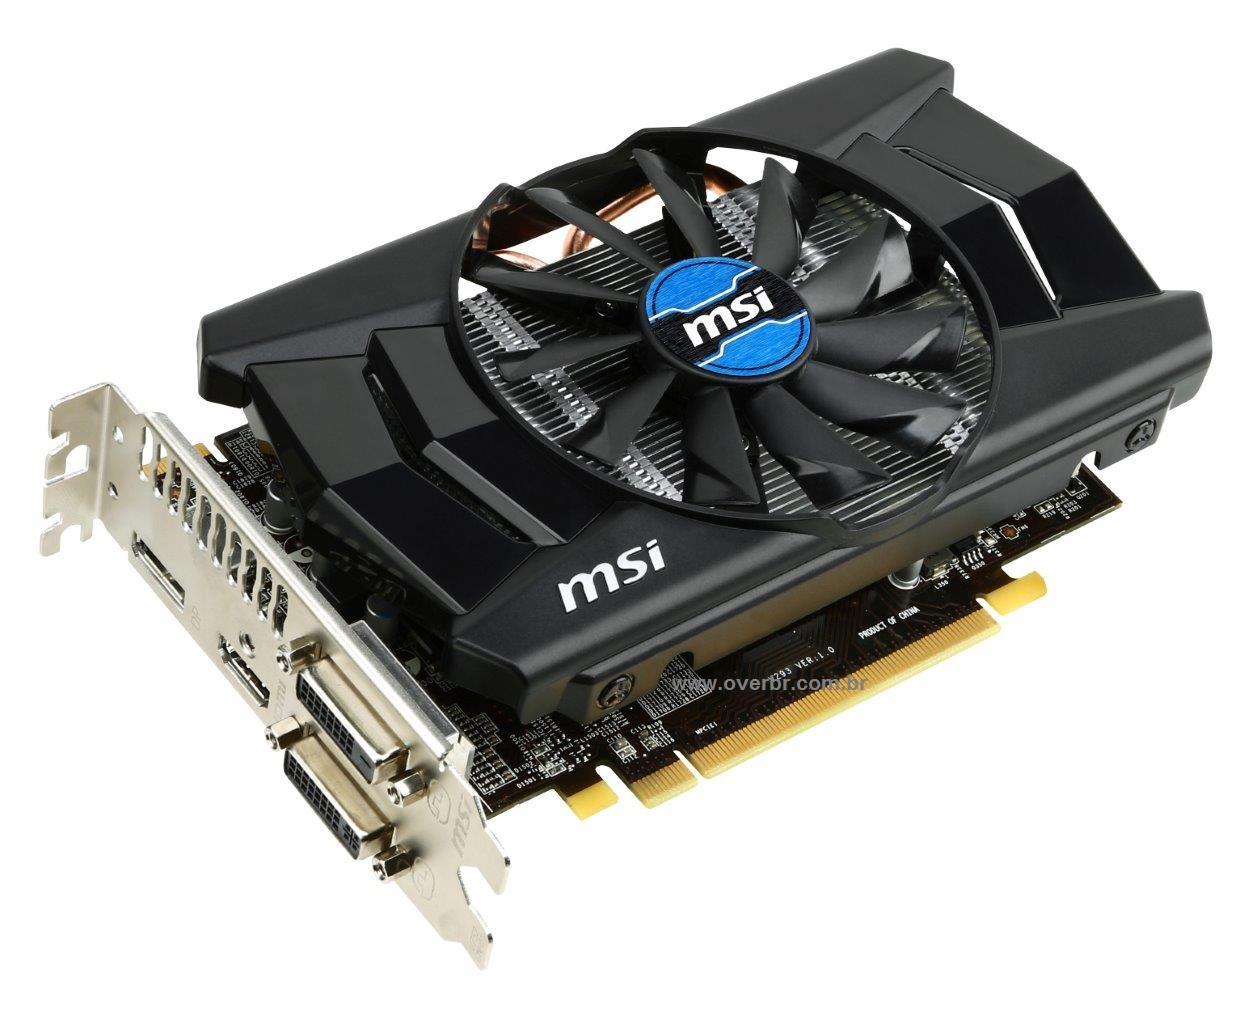 R7 260X 2GD5OC(V293)_3D-Terabyte